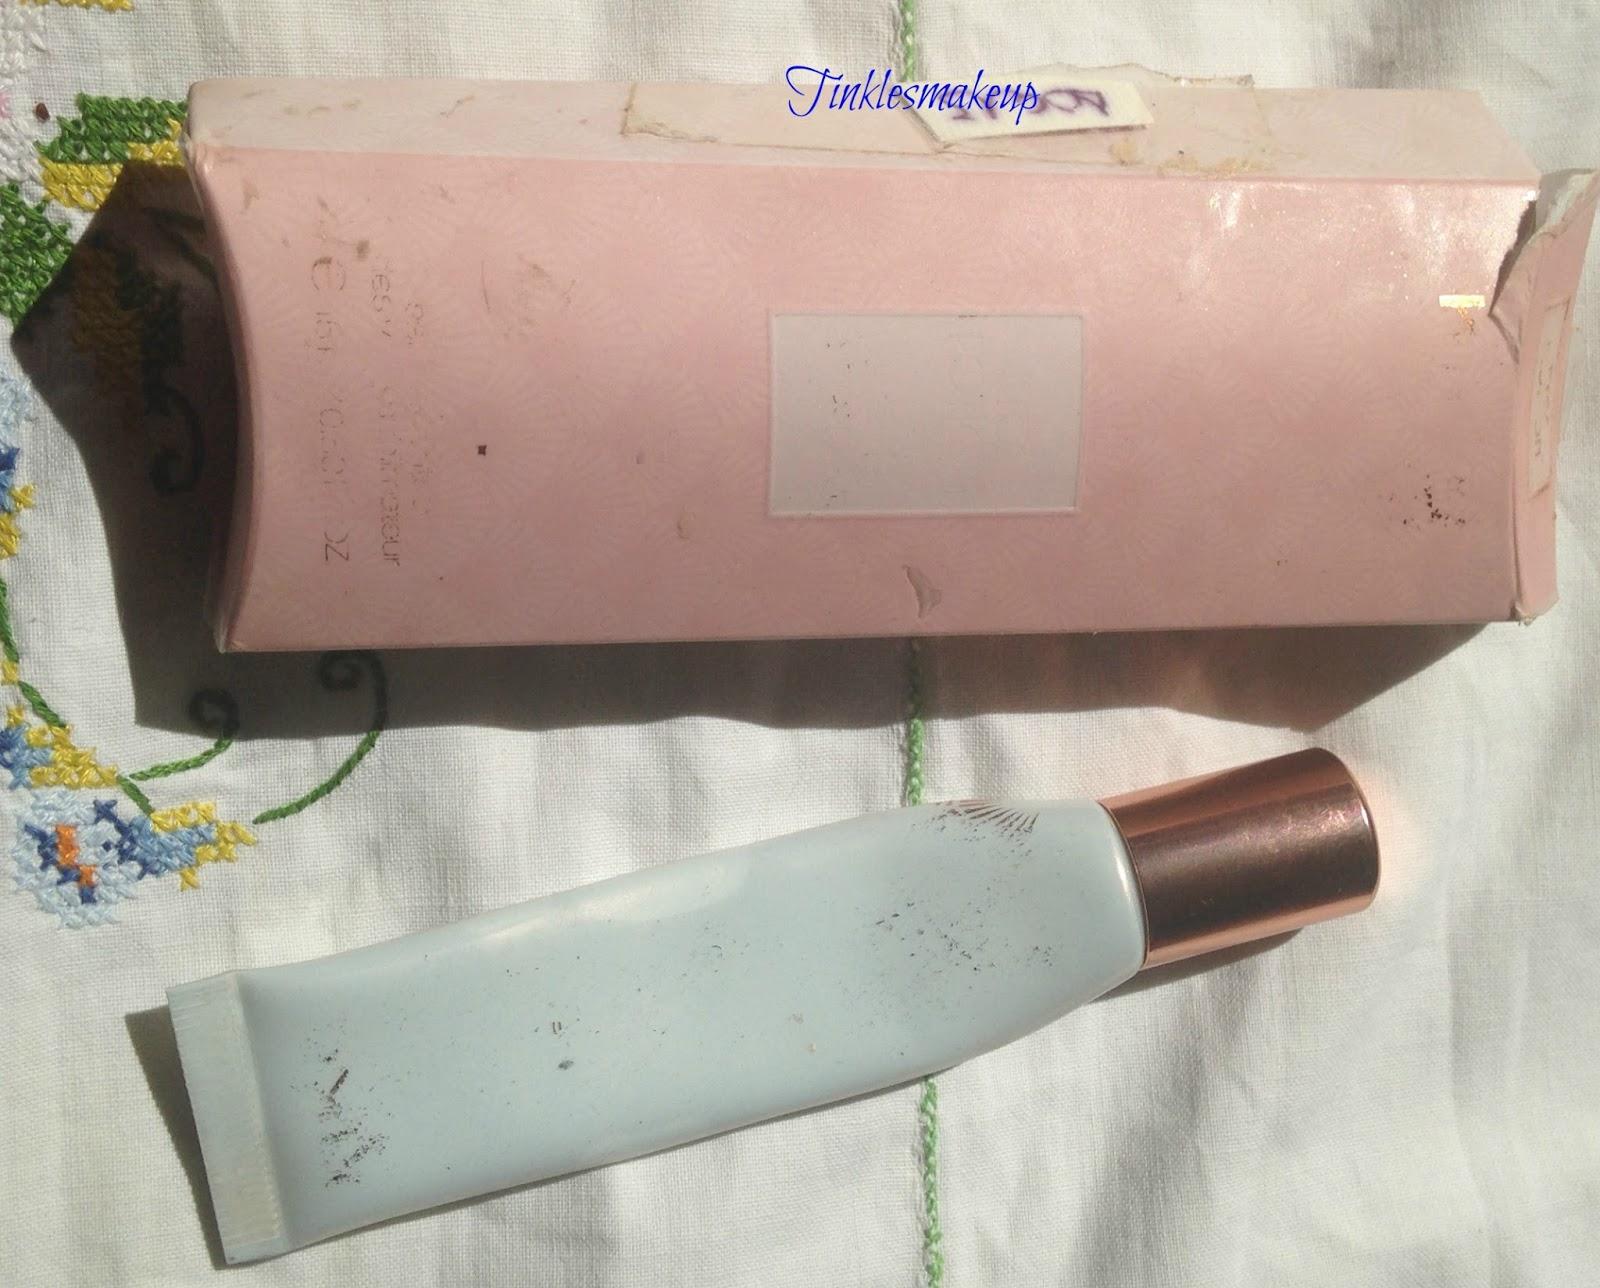 Prezzi di decolorazione di pelle di faccia